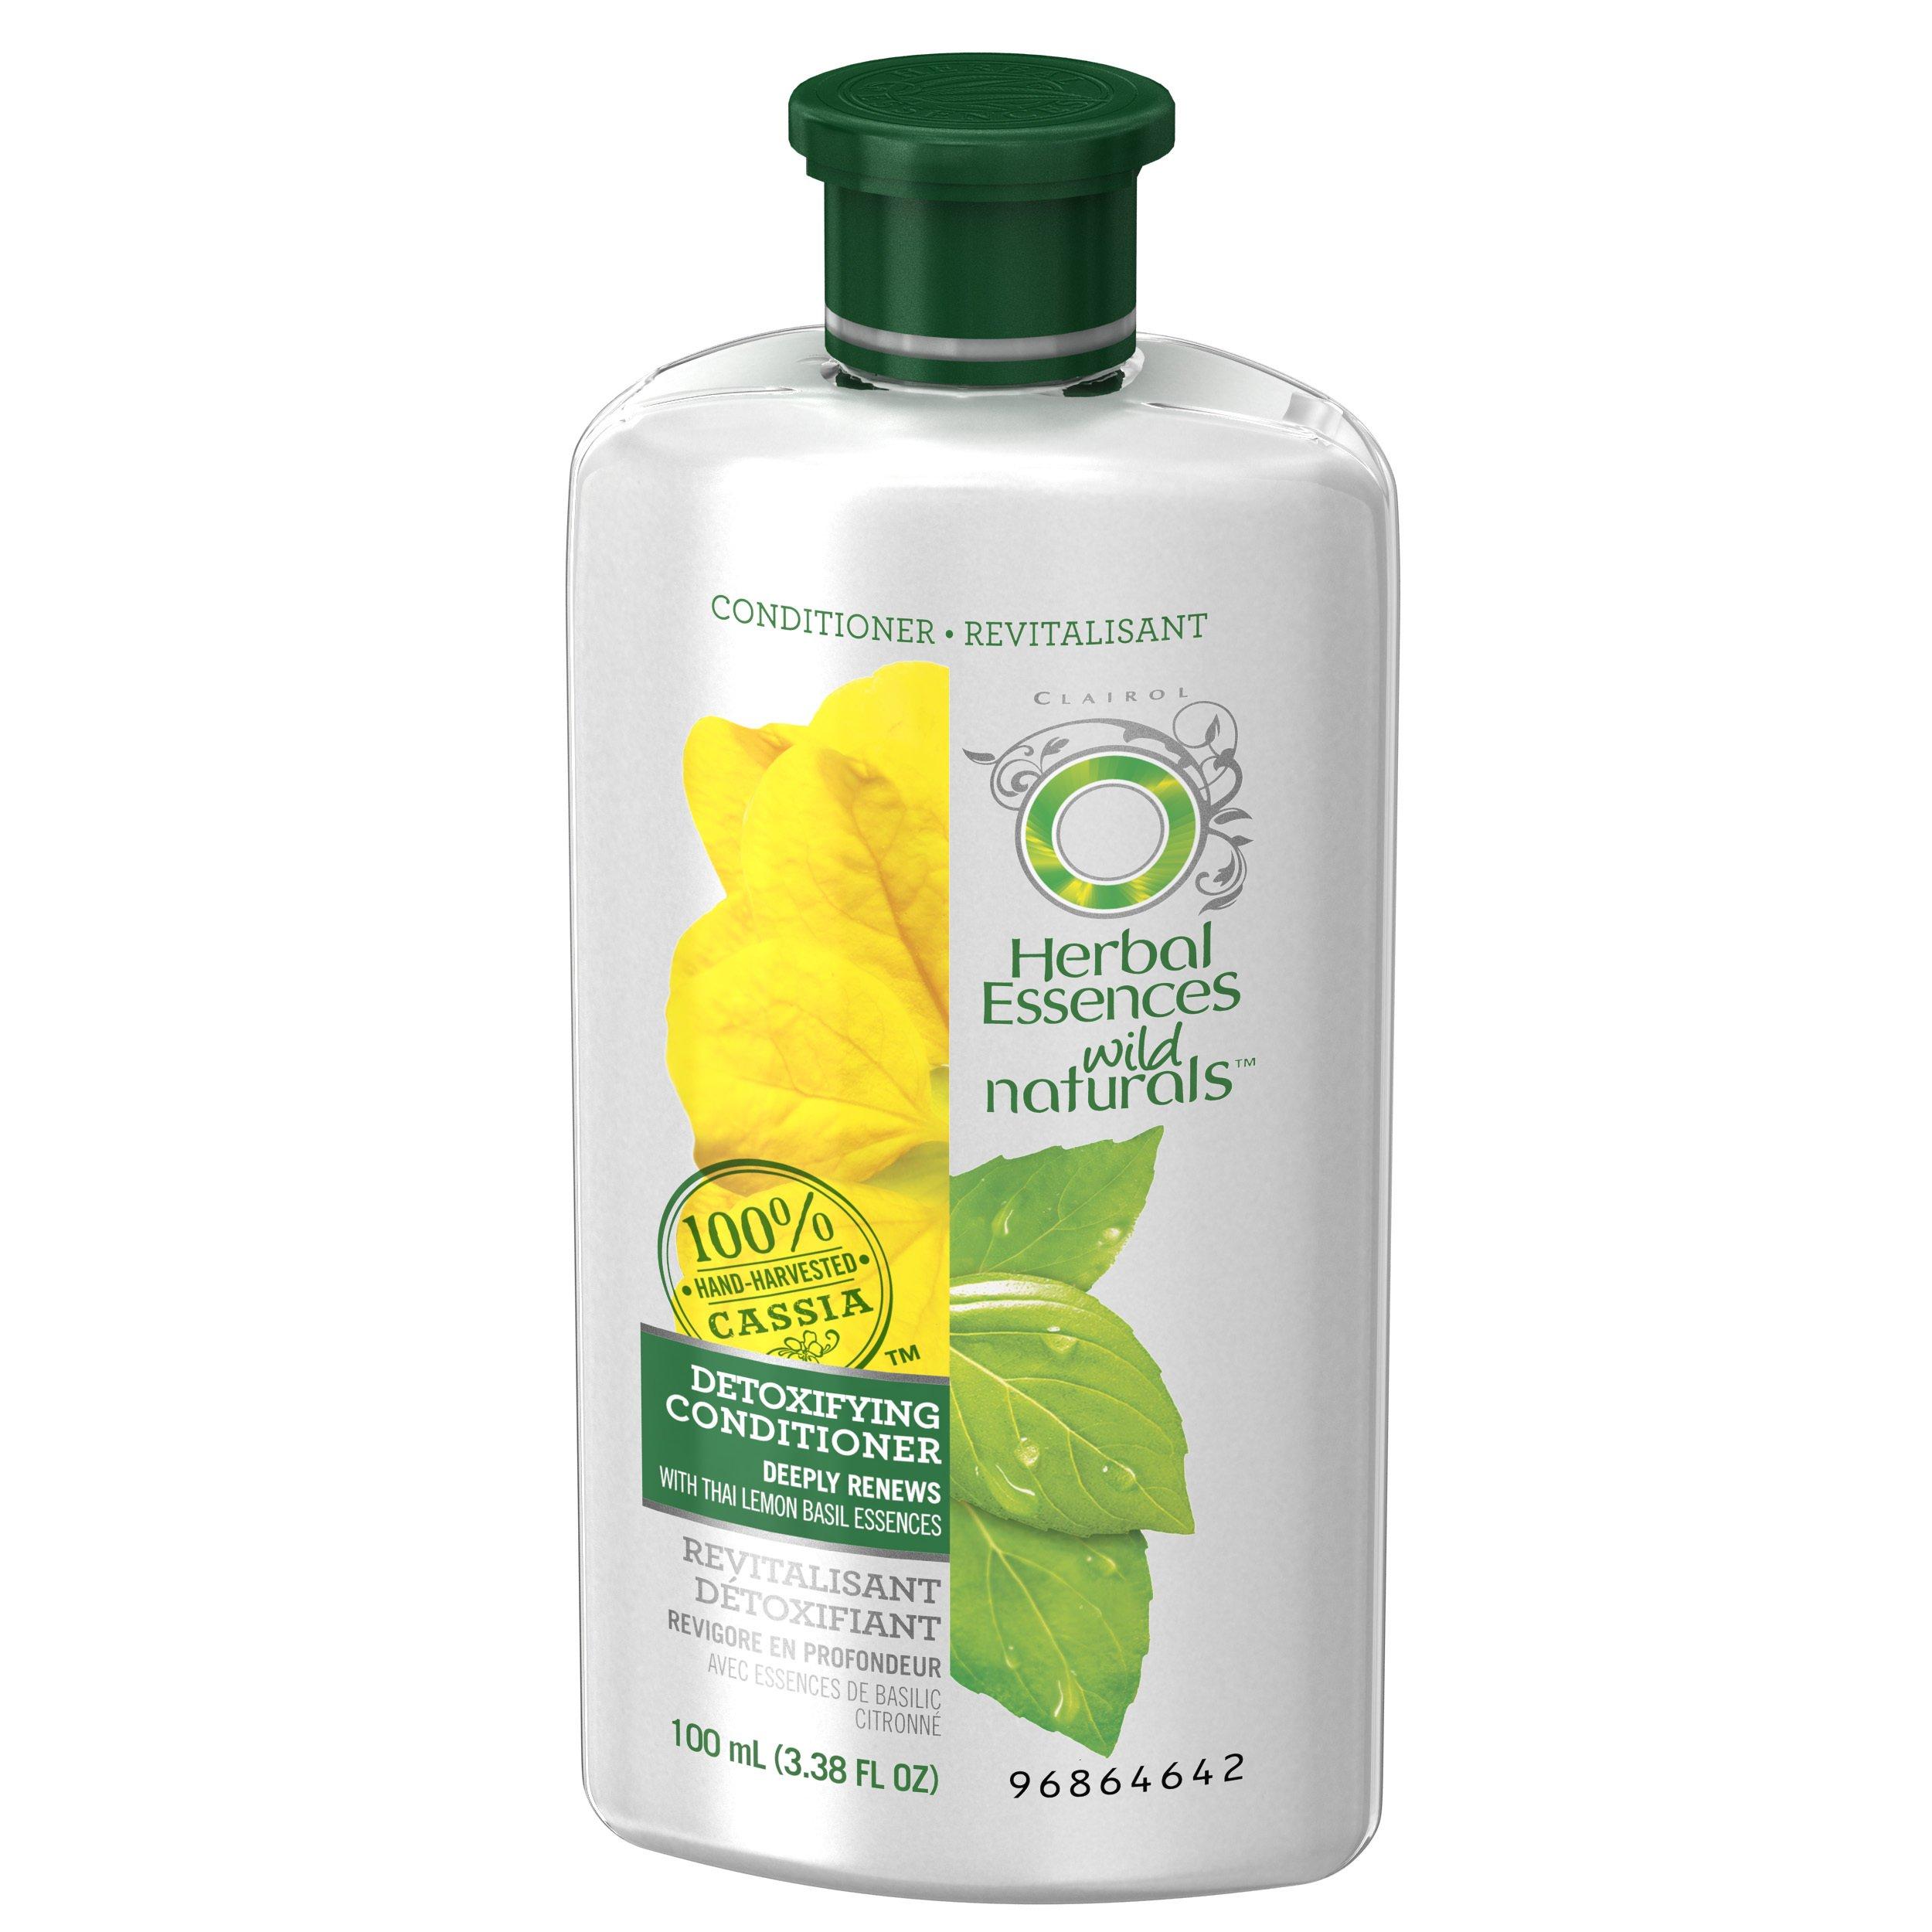 Herbal Essences Wild Naturals Detoxifying Conditioner, 3.38 FL OZ by Herbal Essences (Image #4)